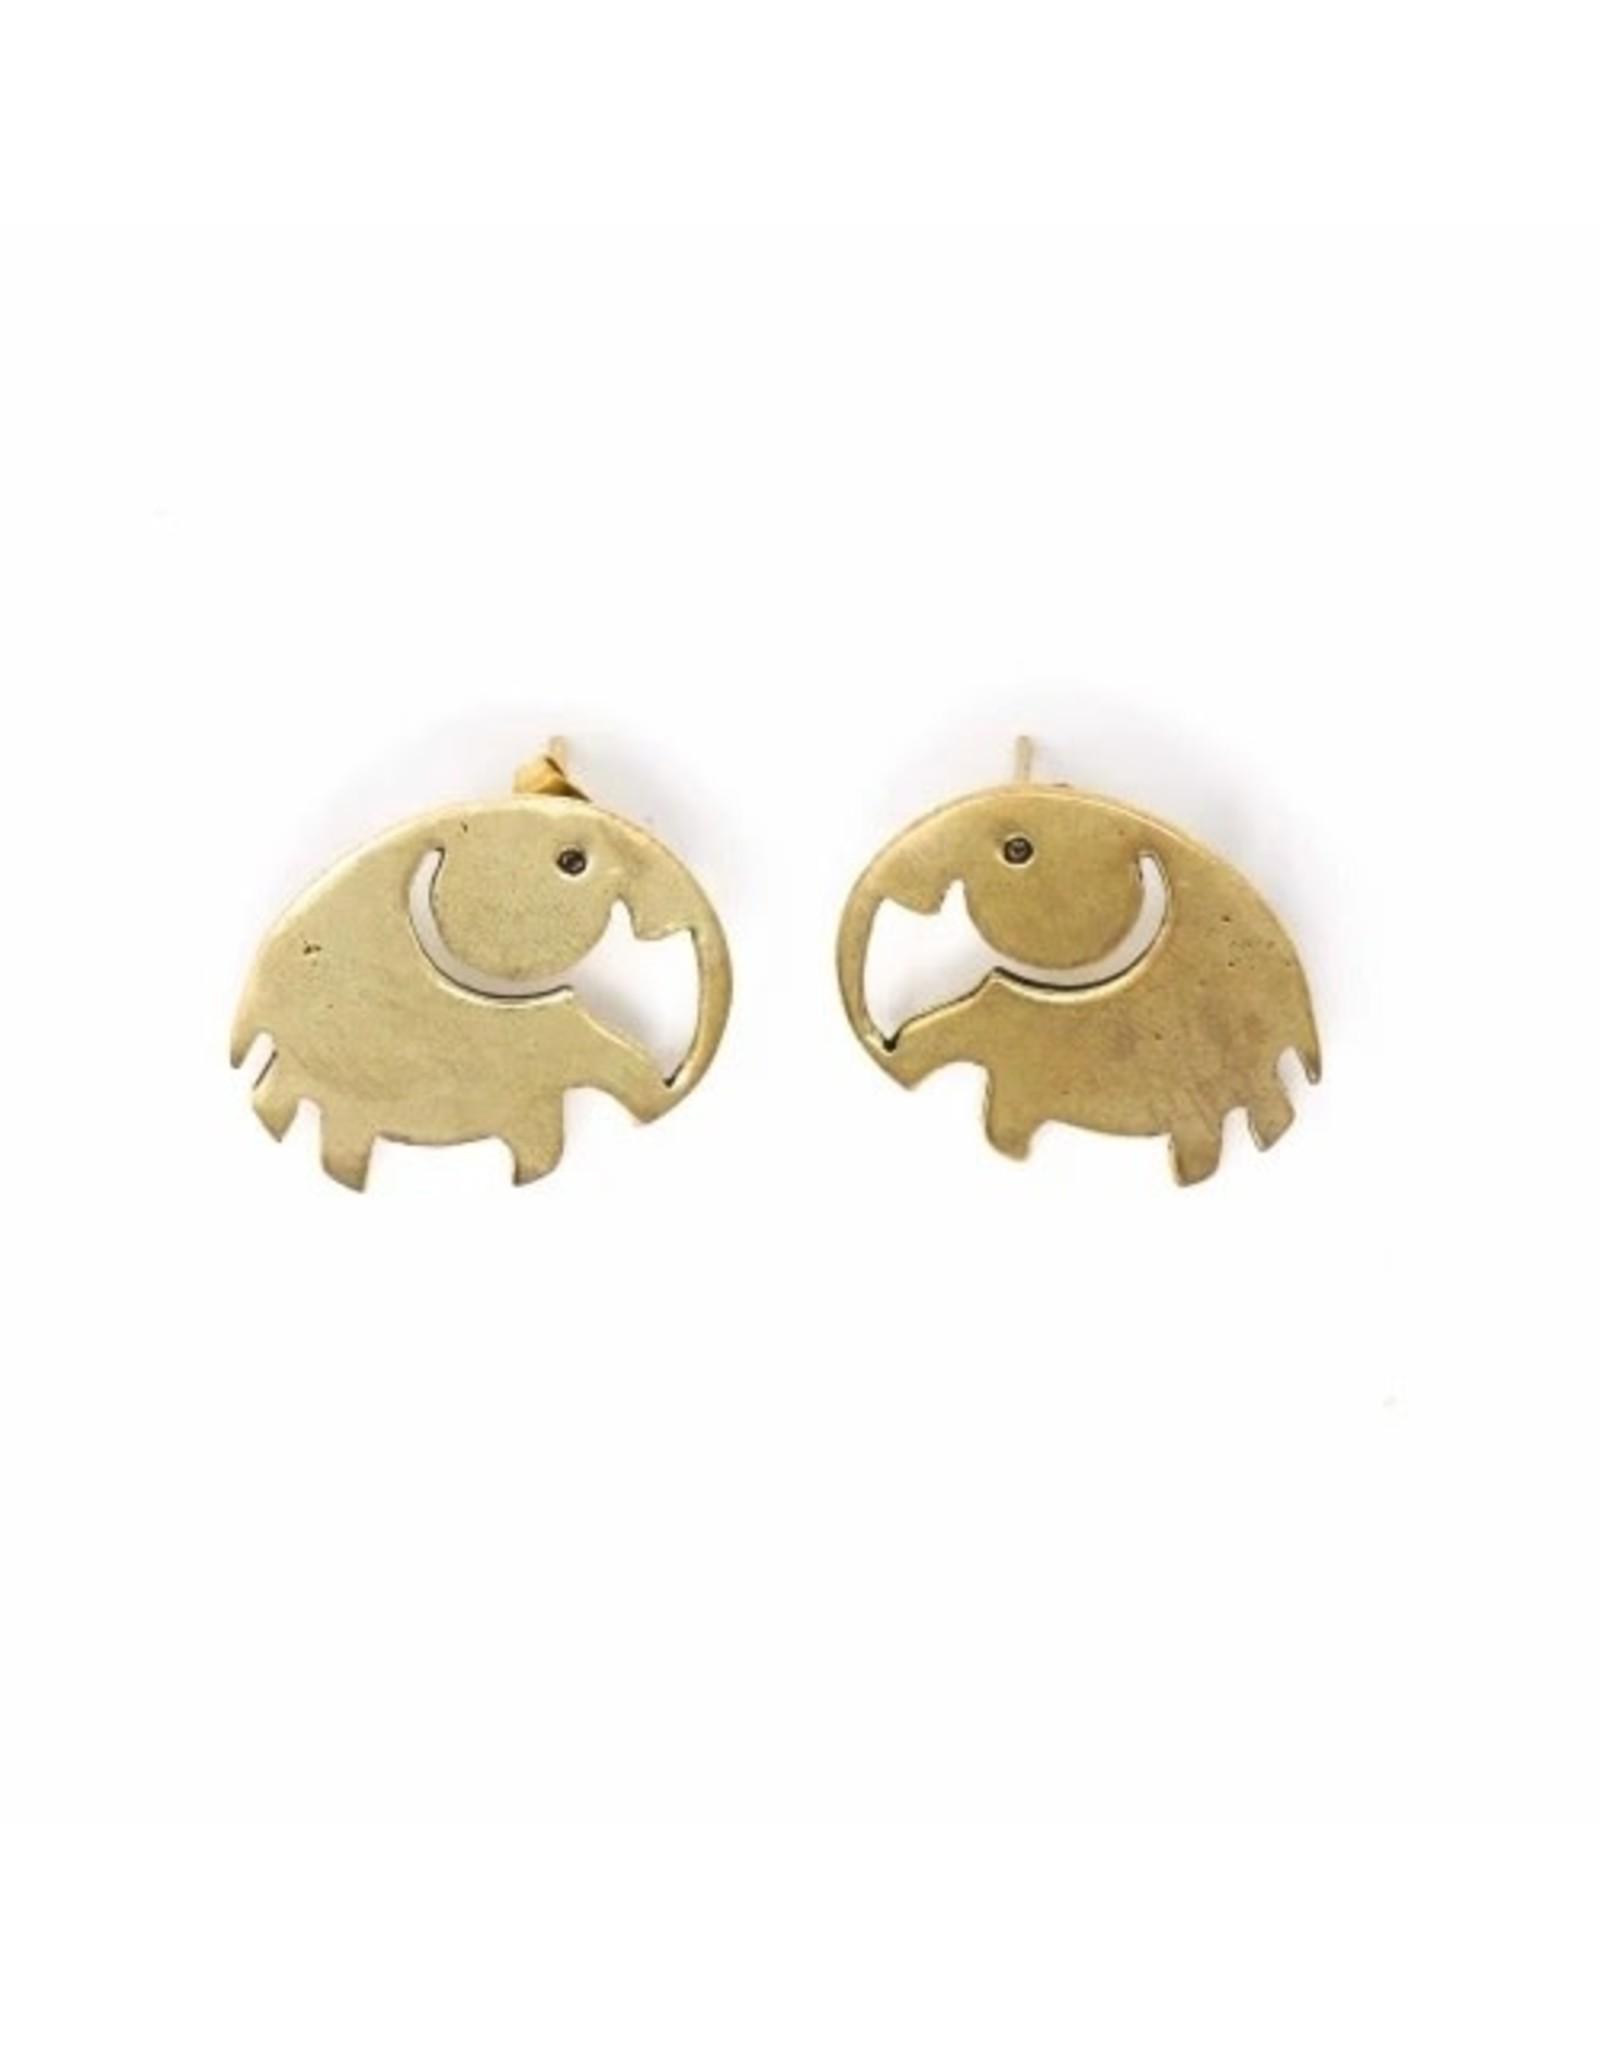 Global Crafts Brass Elephant Stud Earrings, India